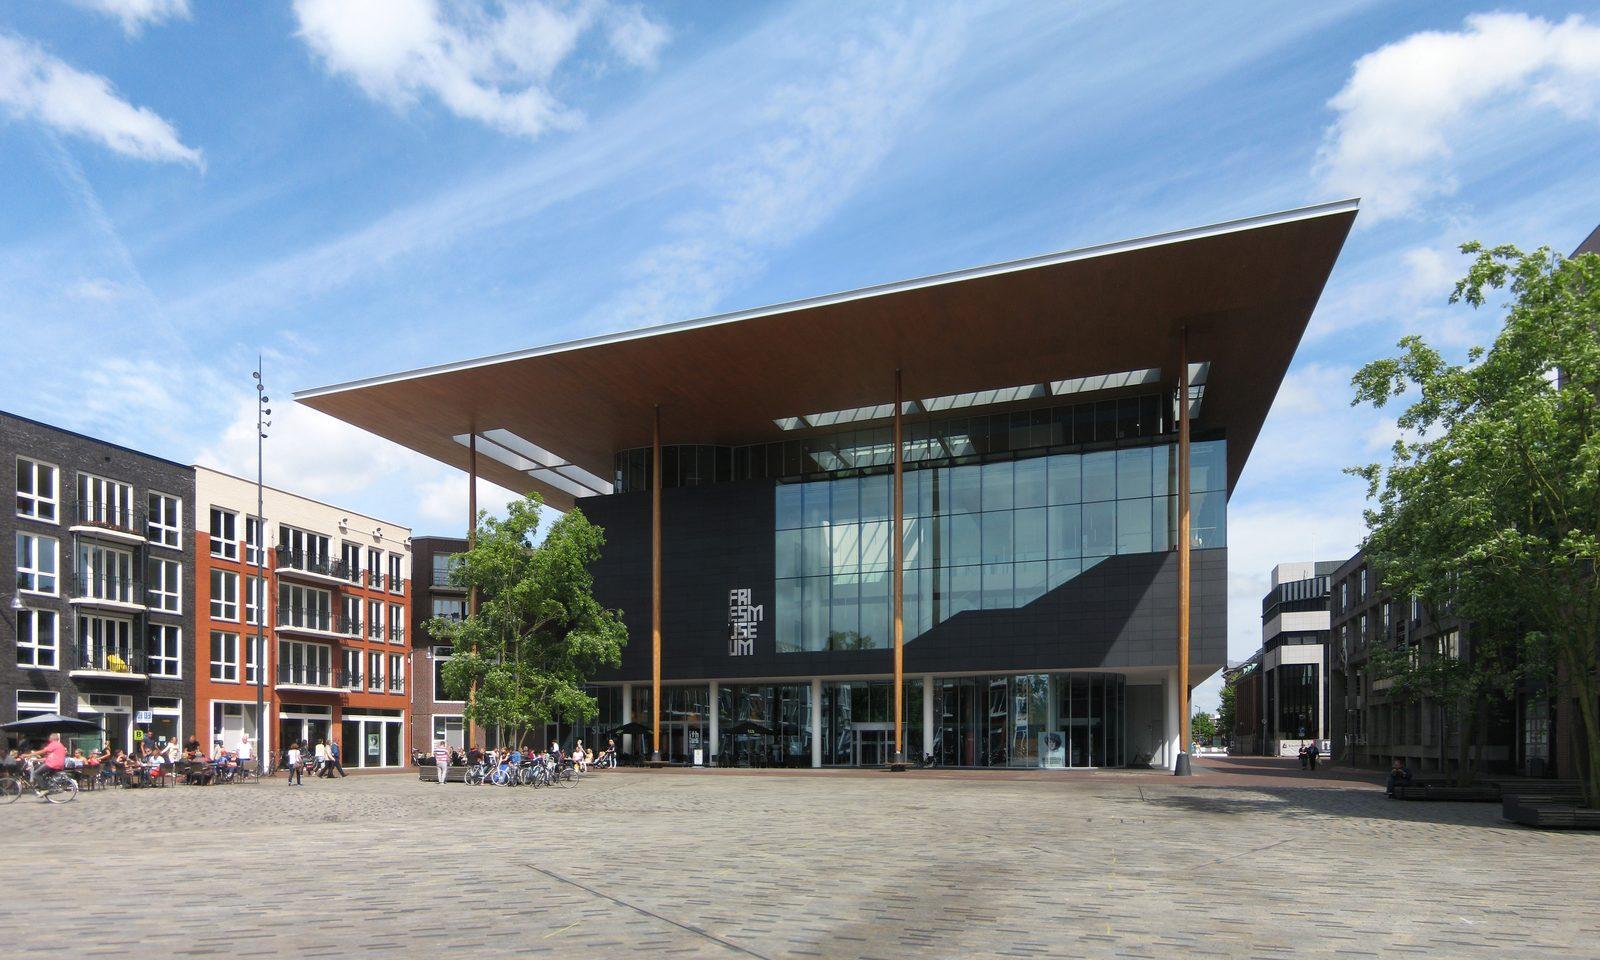 Friesisches Museum – Leeuwarden